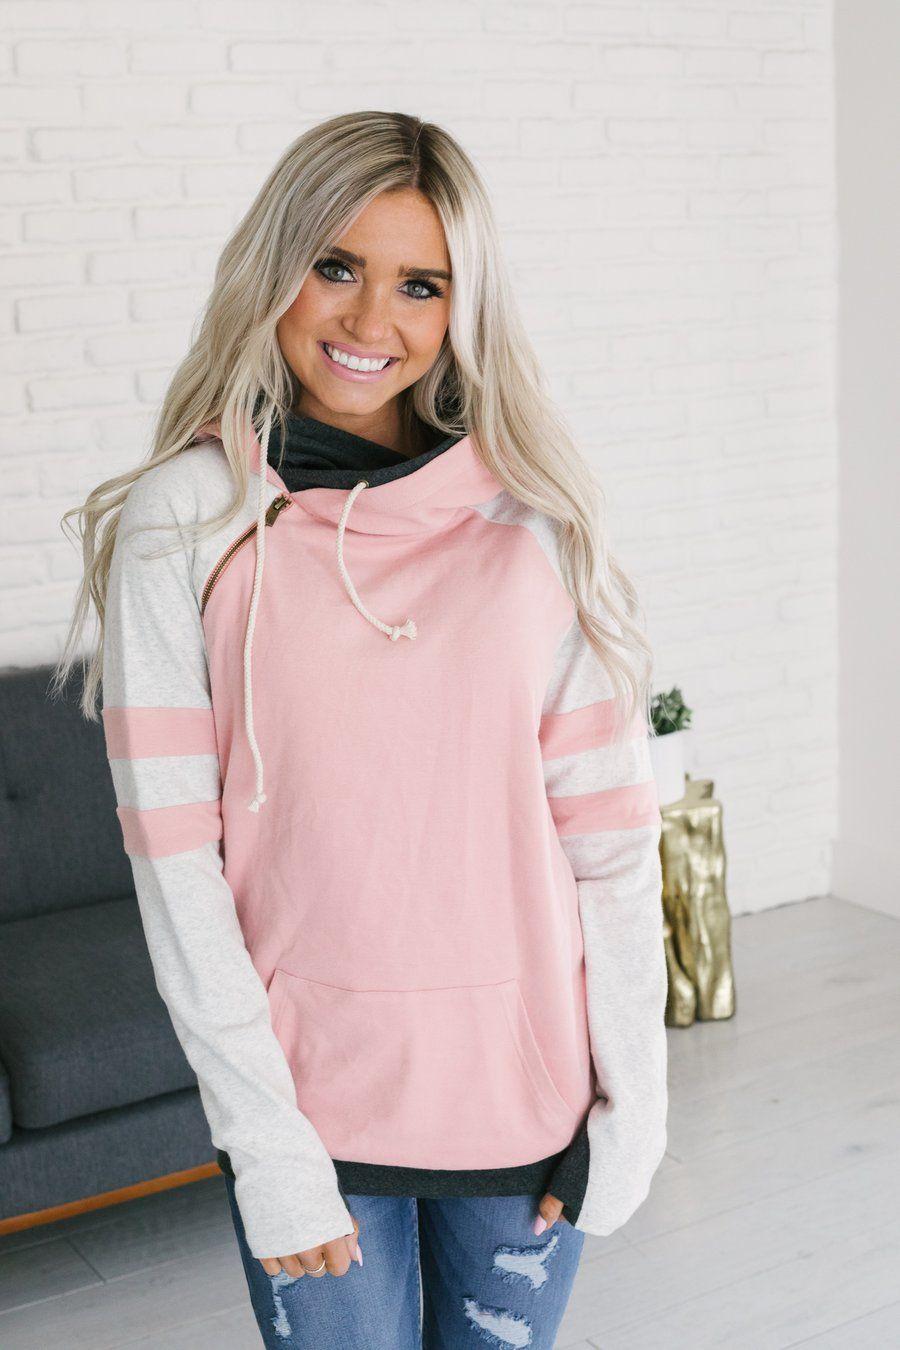 Original Source For A Doublehood This Adorable Pink Double Hooded Sweatshirt Is The Perfect Pink Sweatshirt Double Hooded Sweatshirt Double Hoodie Sweatshirt [ 1350 x 900 Pixel ]